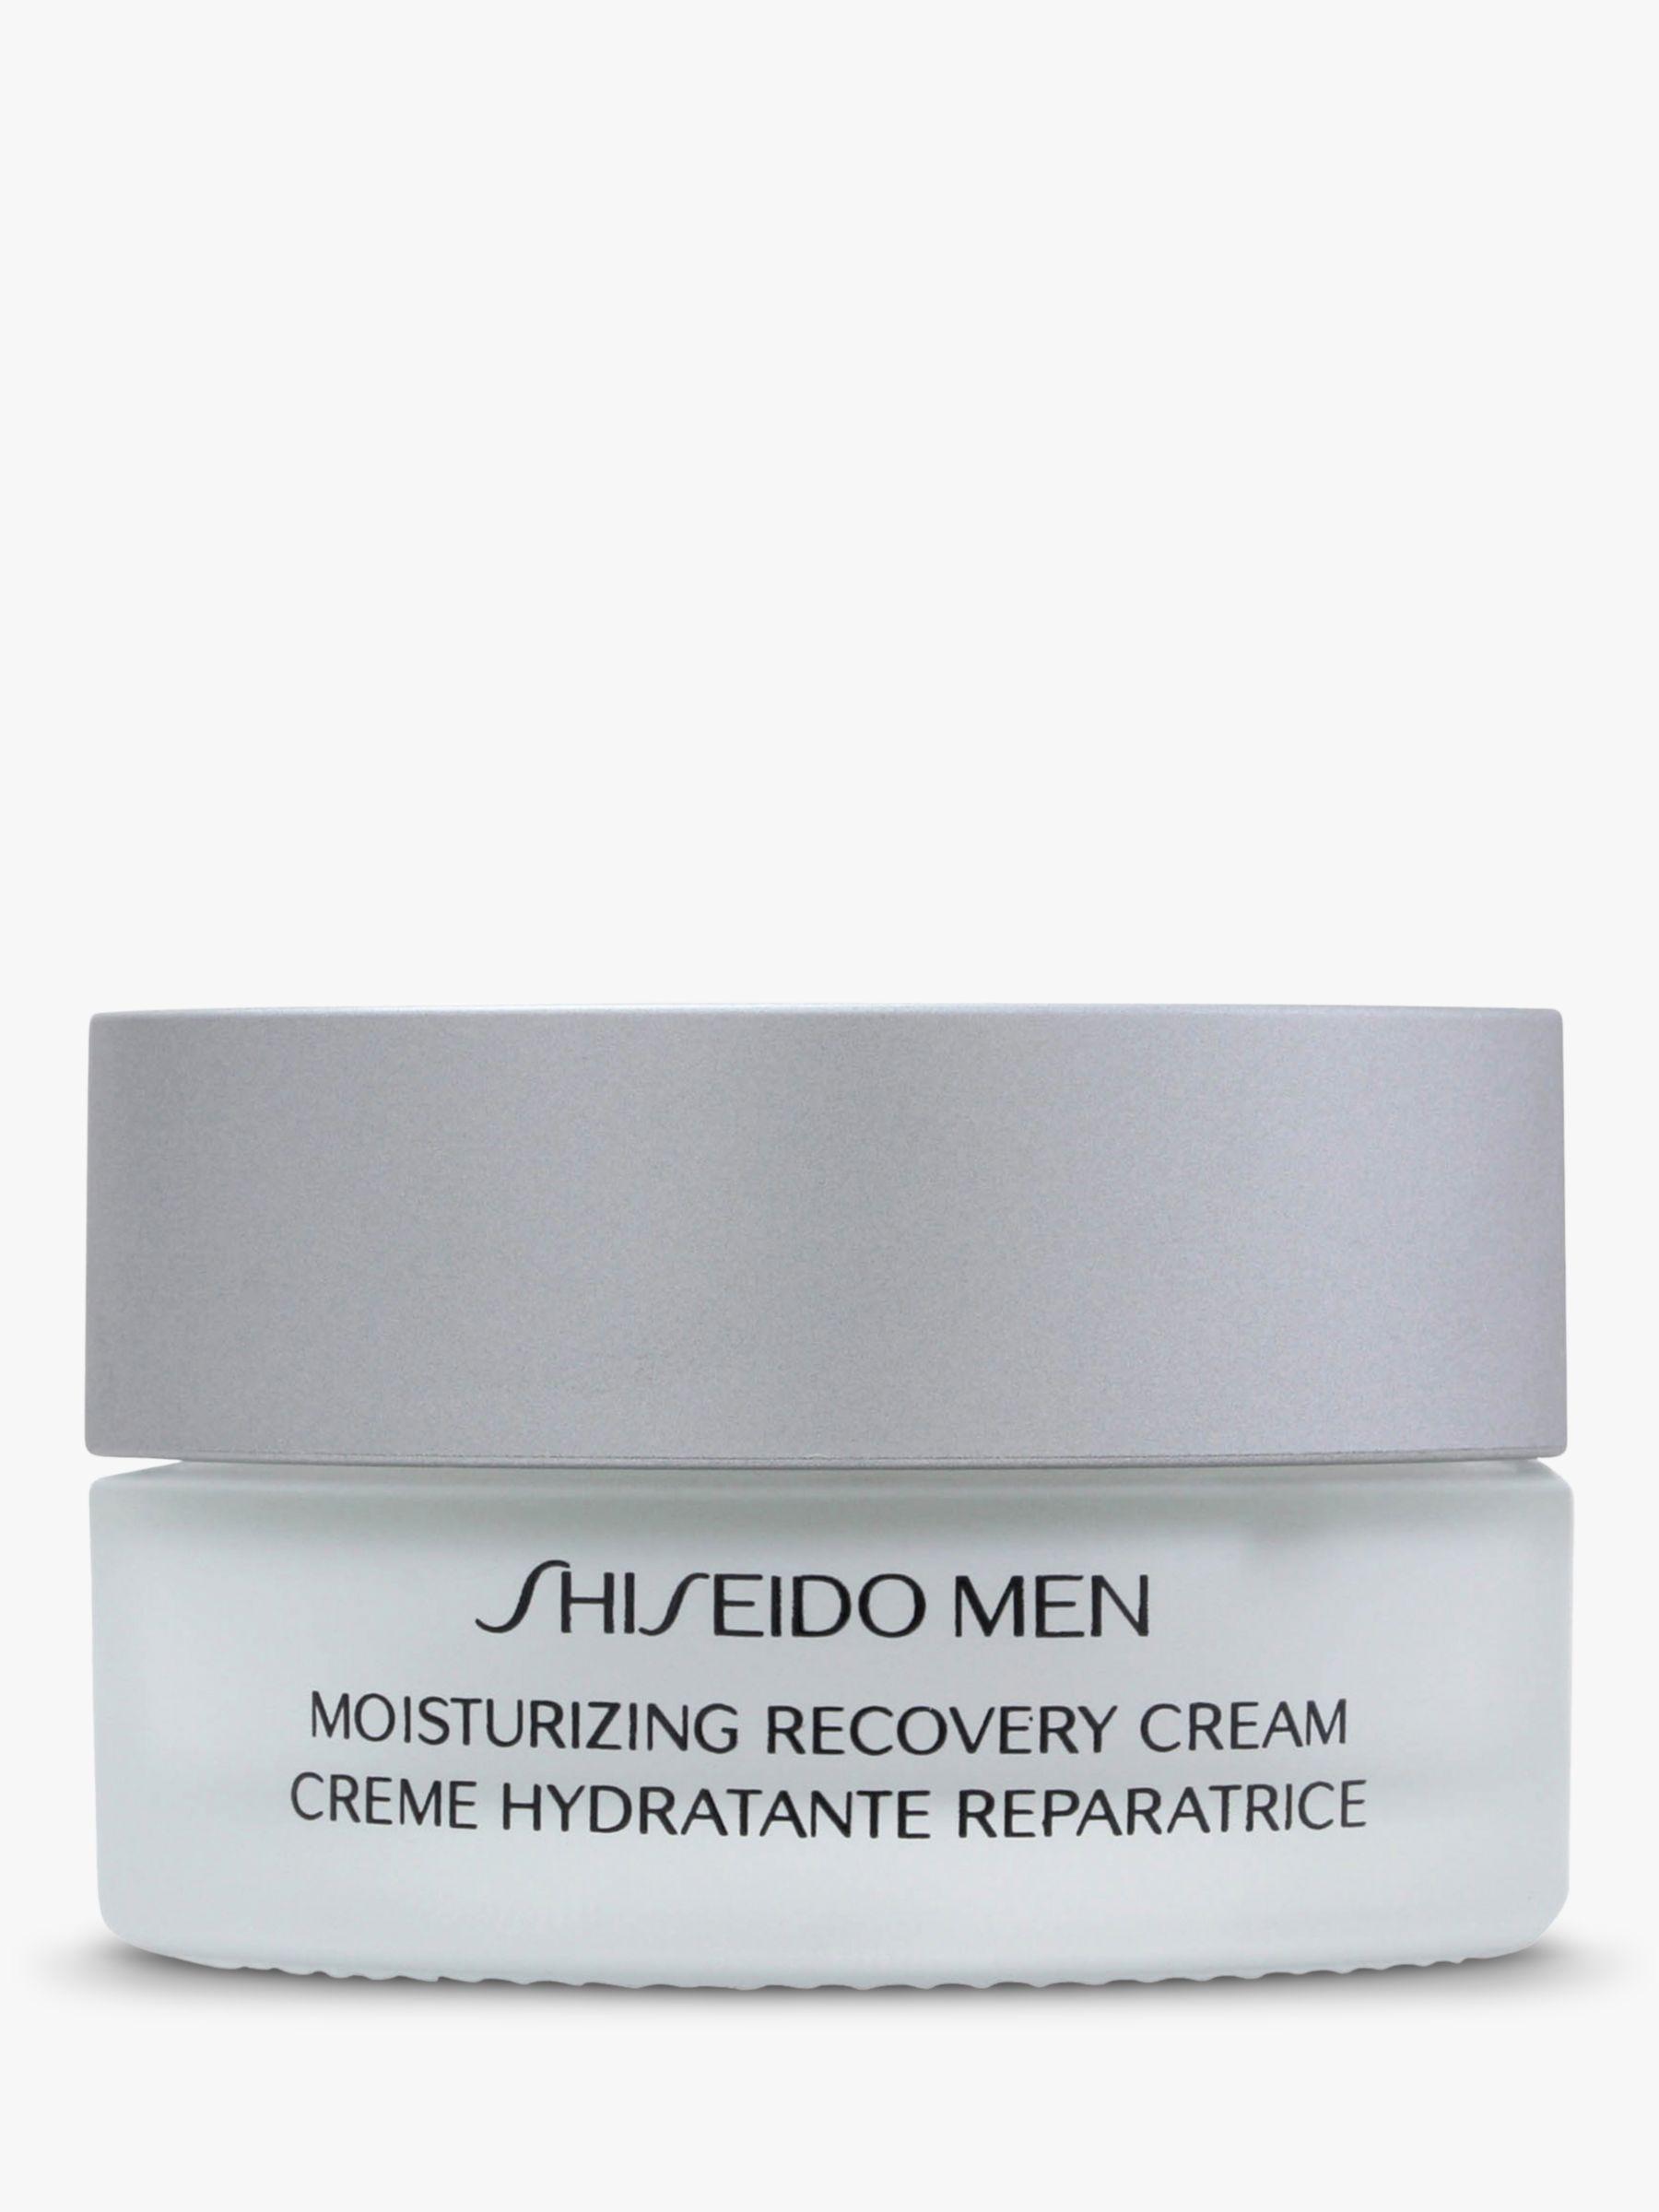 Shiseido Shiseido Men Moisturizing Recovery Cream, 50ml